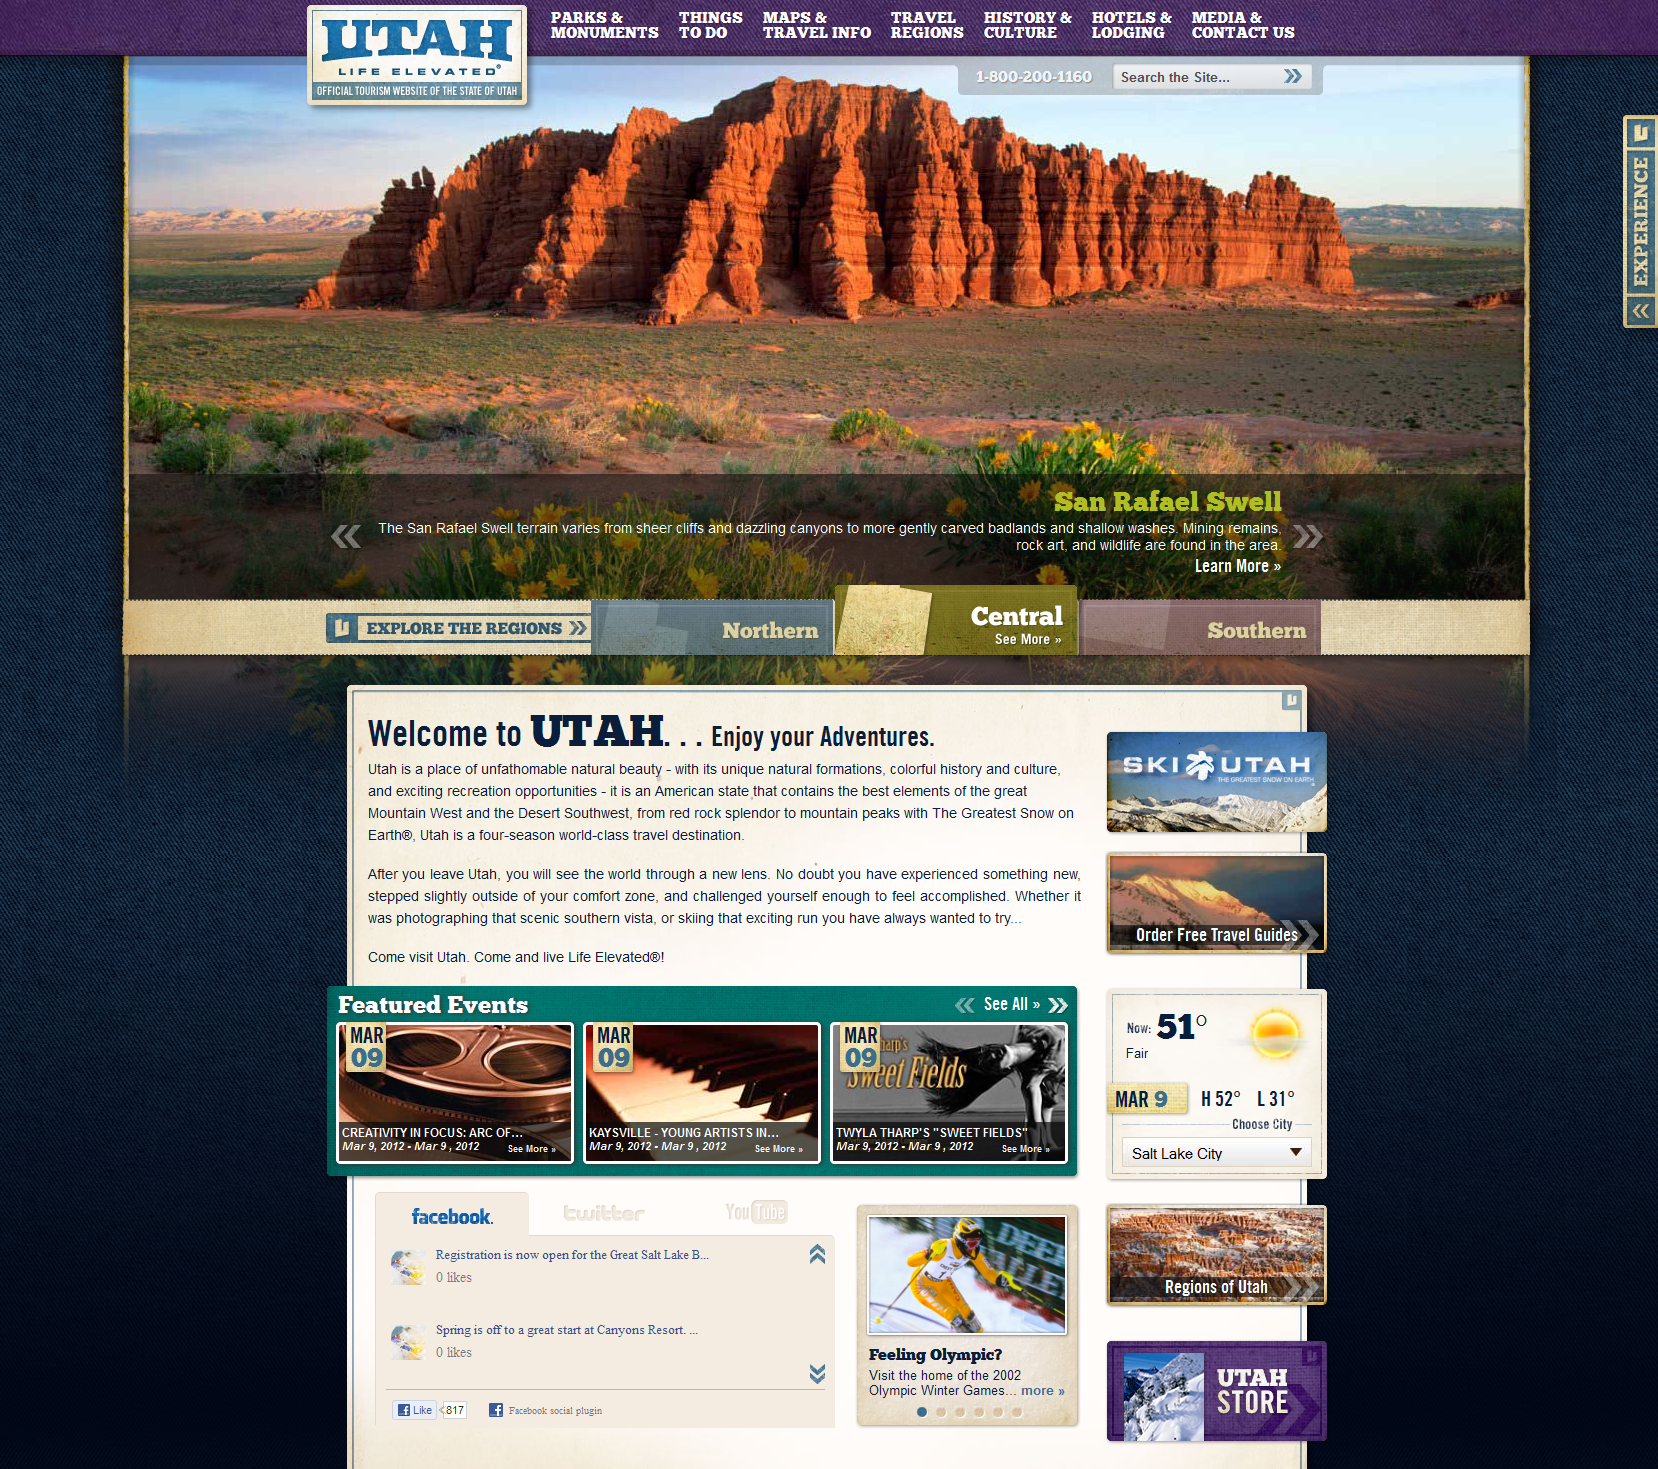 Utah Tourism Website - March 2012